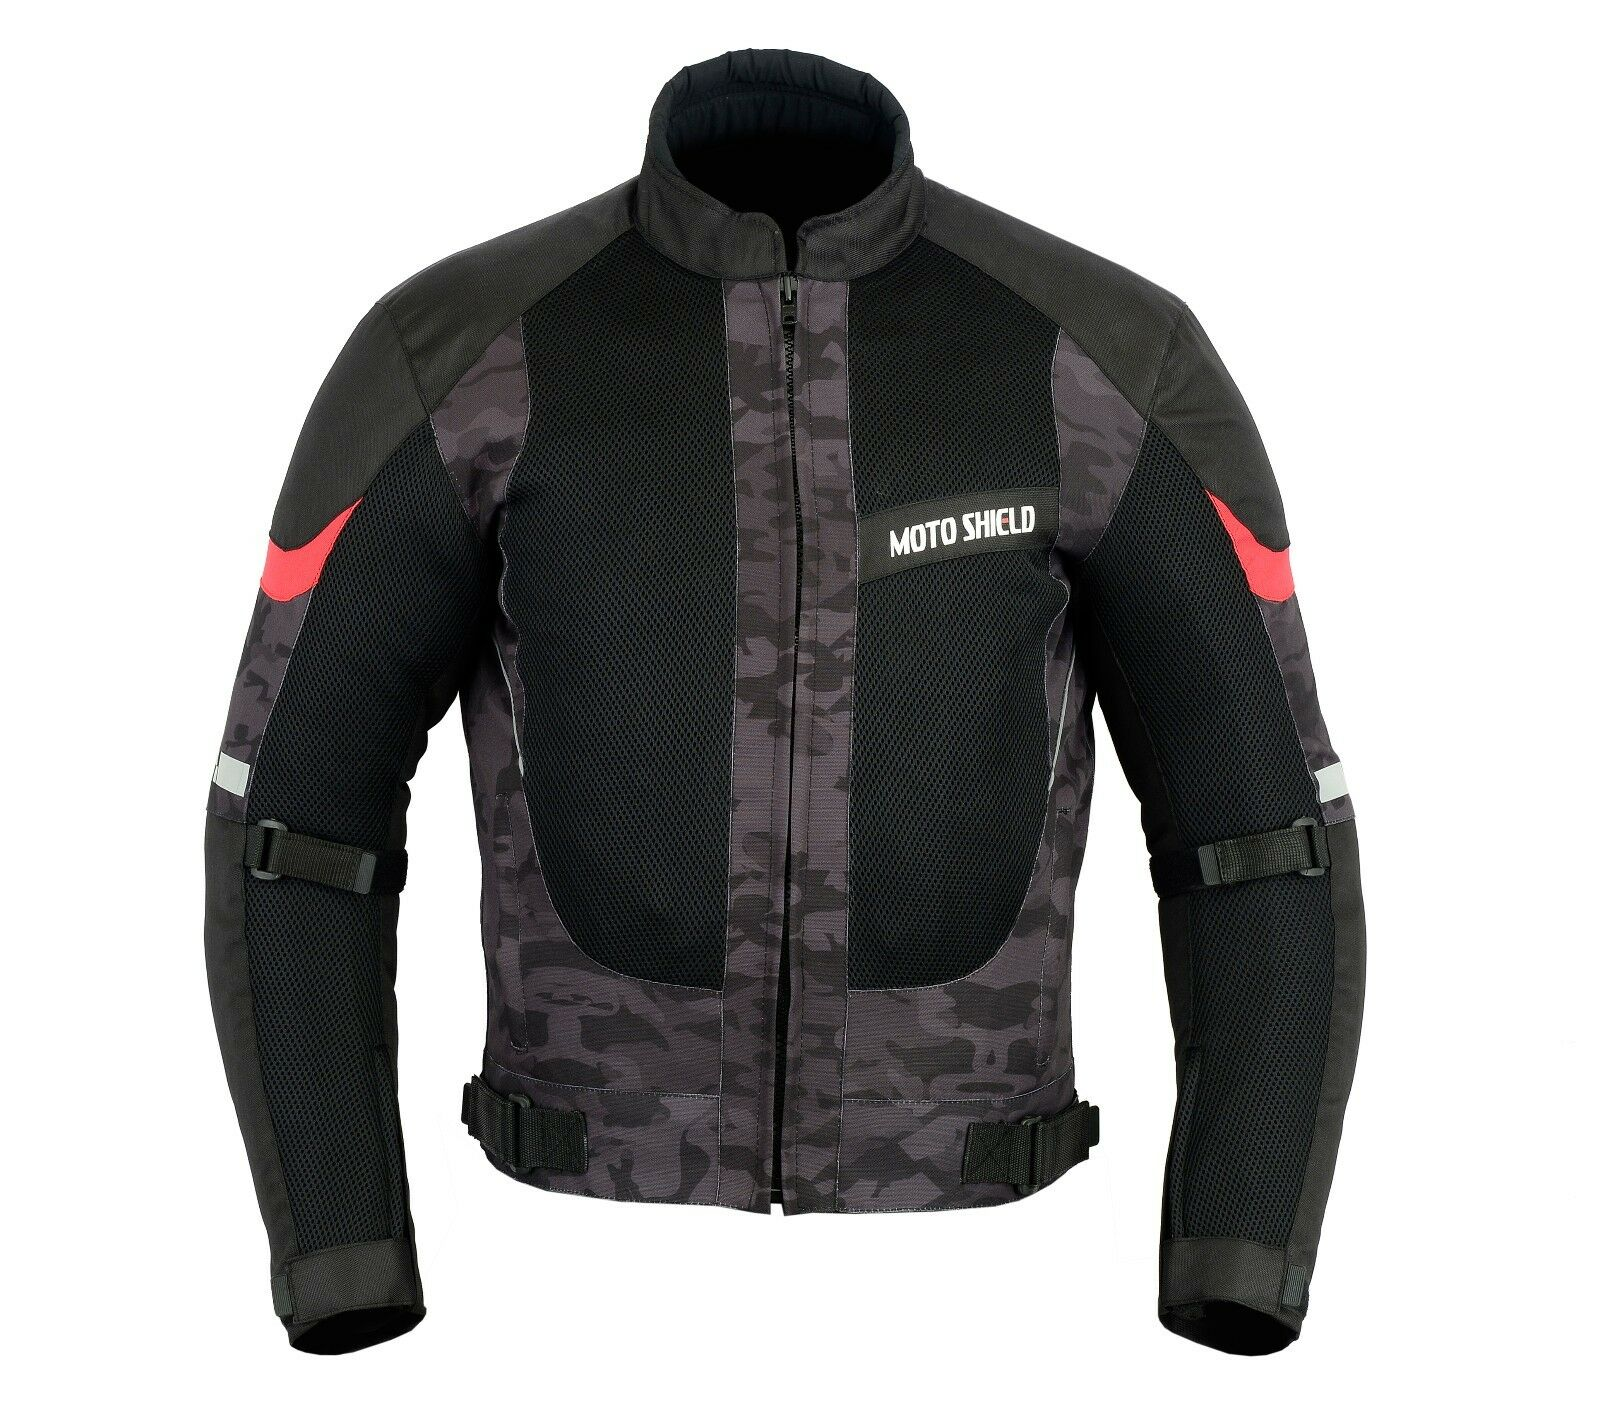 Motorcycle Motorbike Camouflage Men Waterproof CE Protect Cordura Textile Jacket